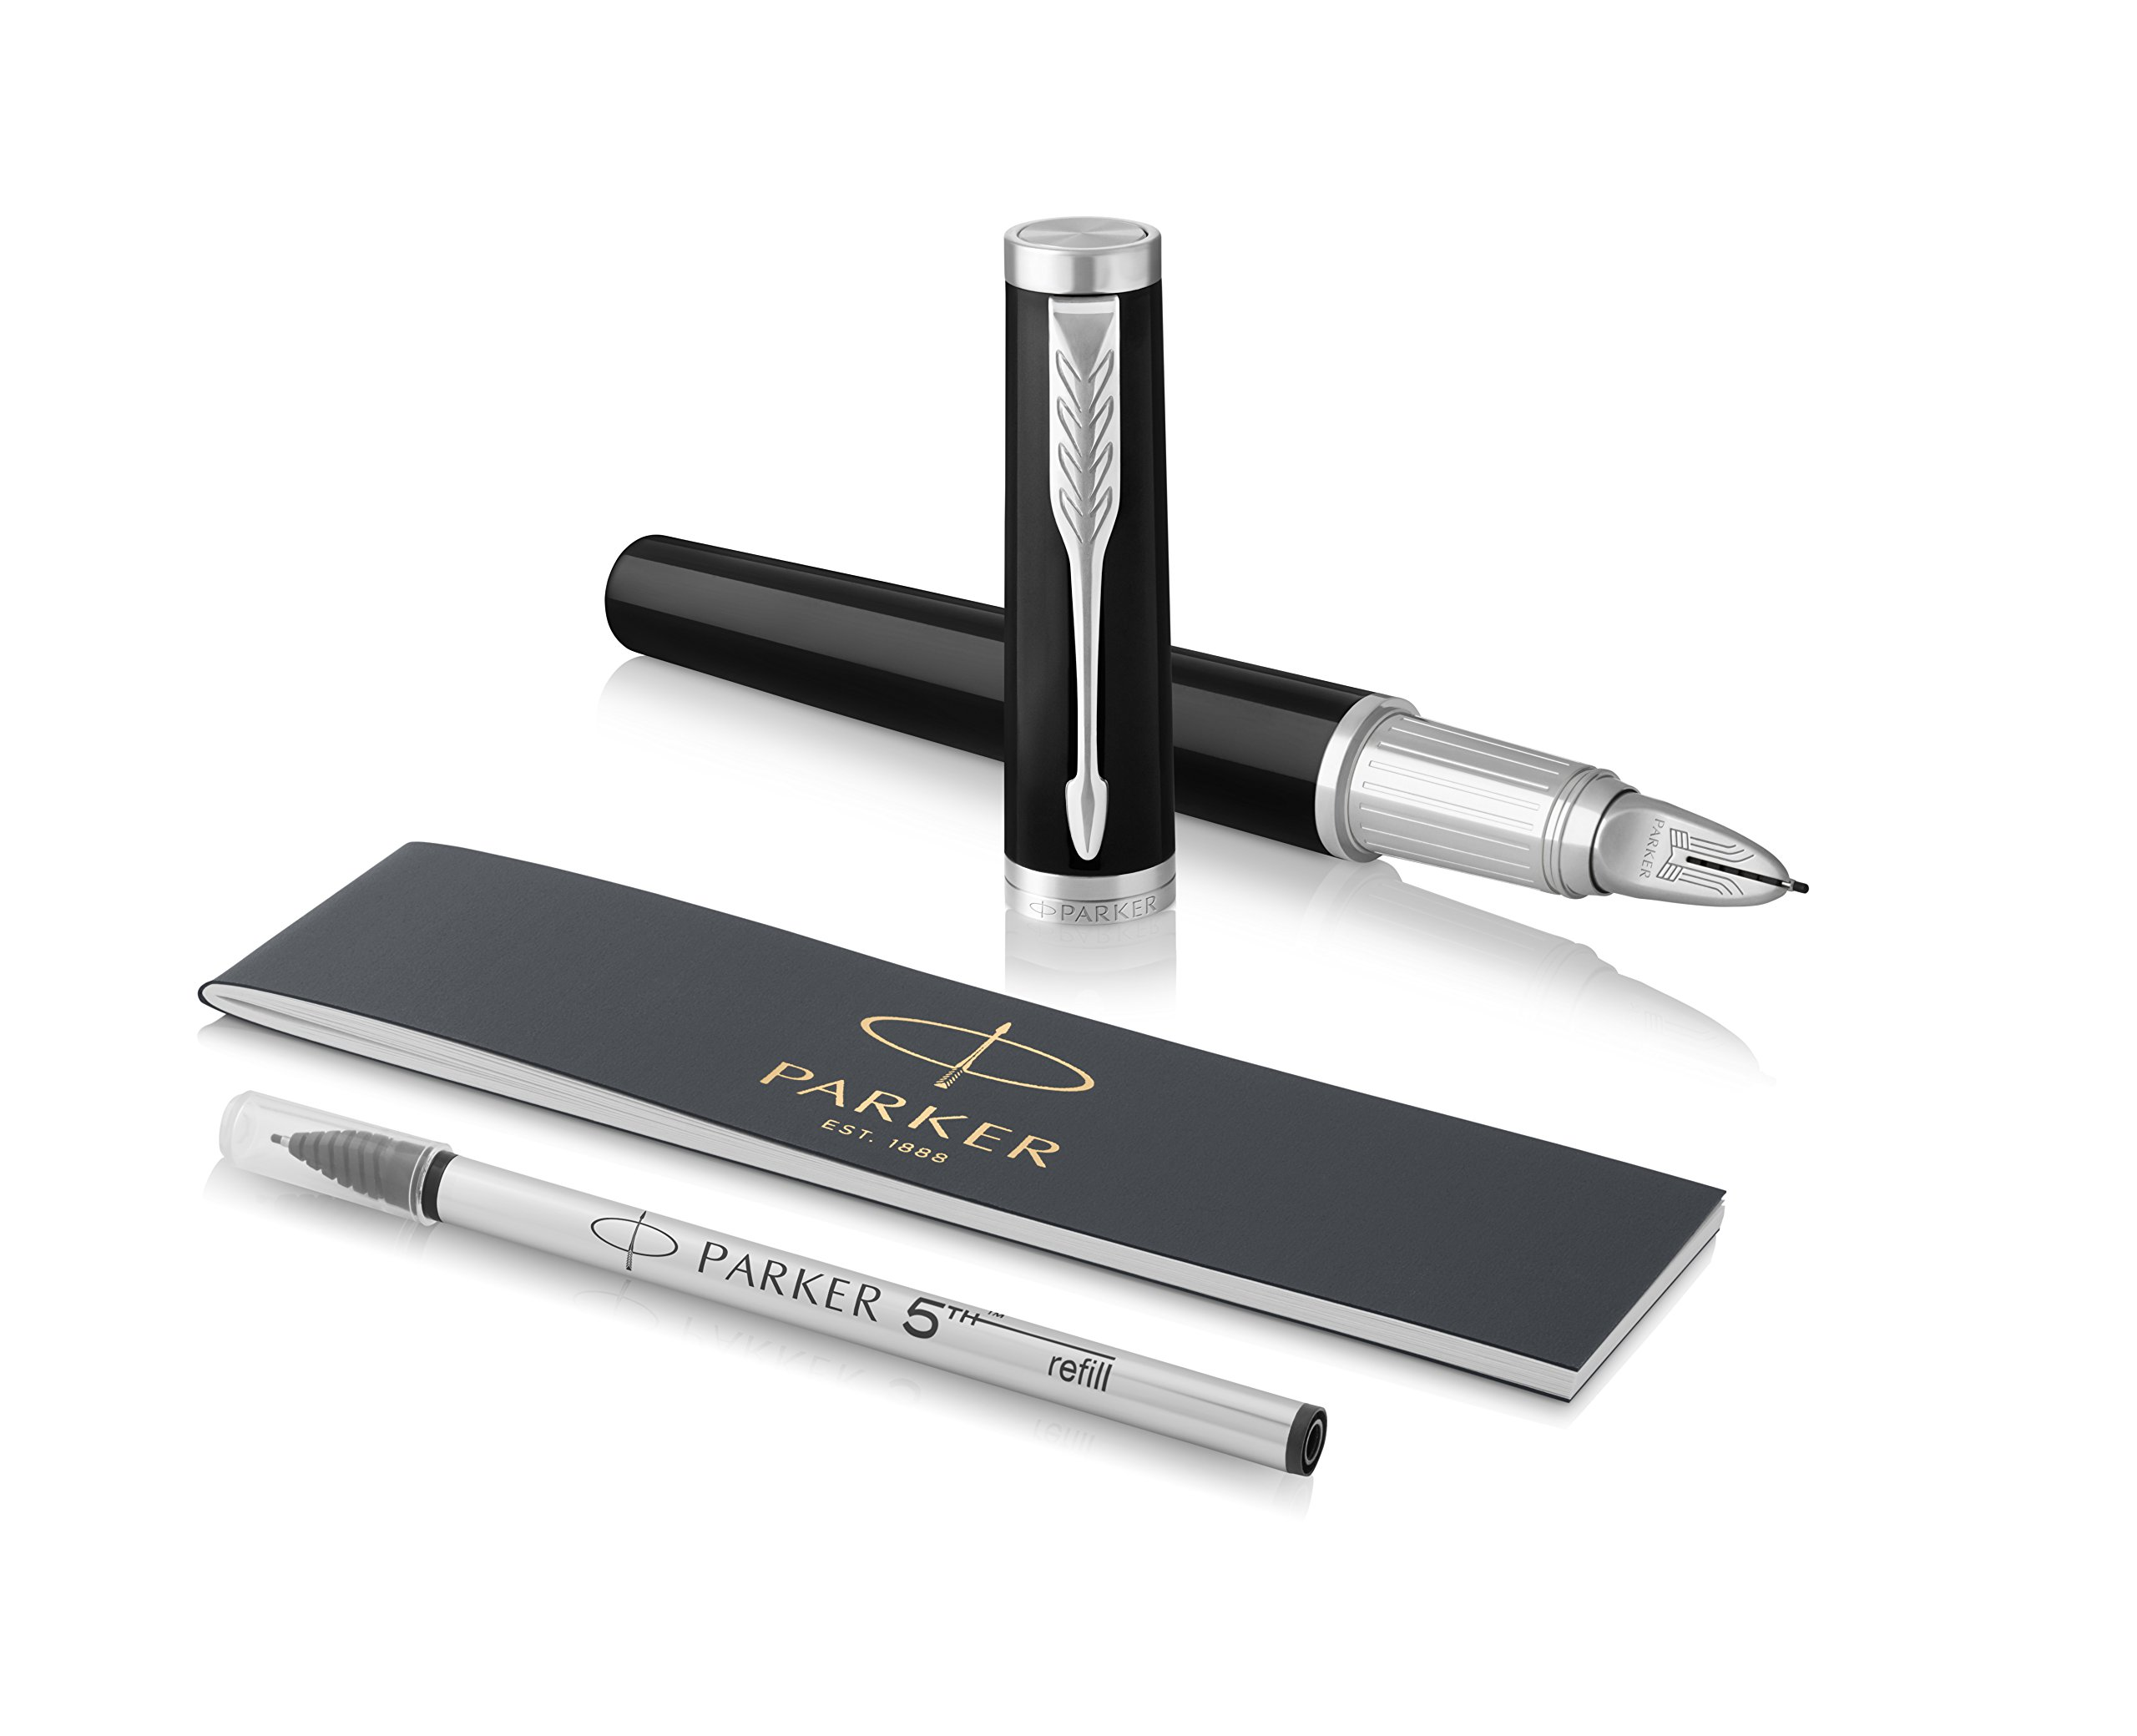 PARKER Ingenuity 5th Technology Large Pen, Black Lacquer...